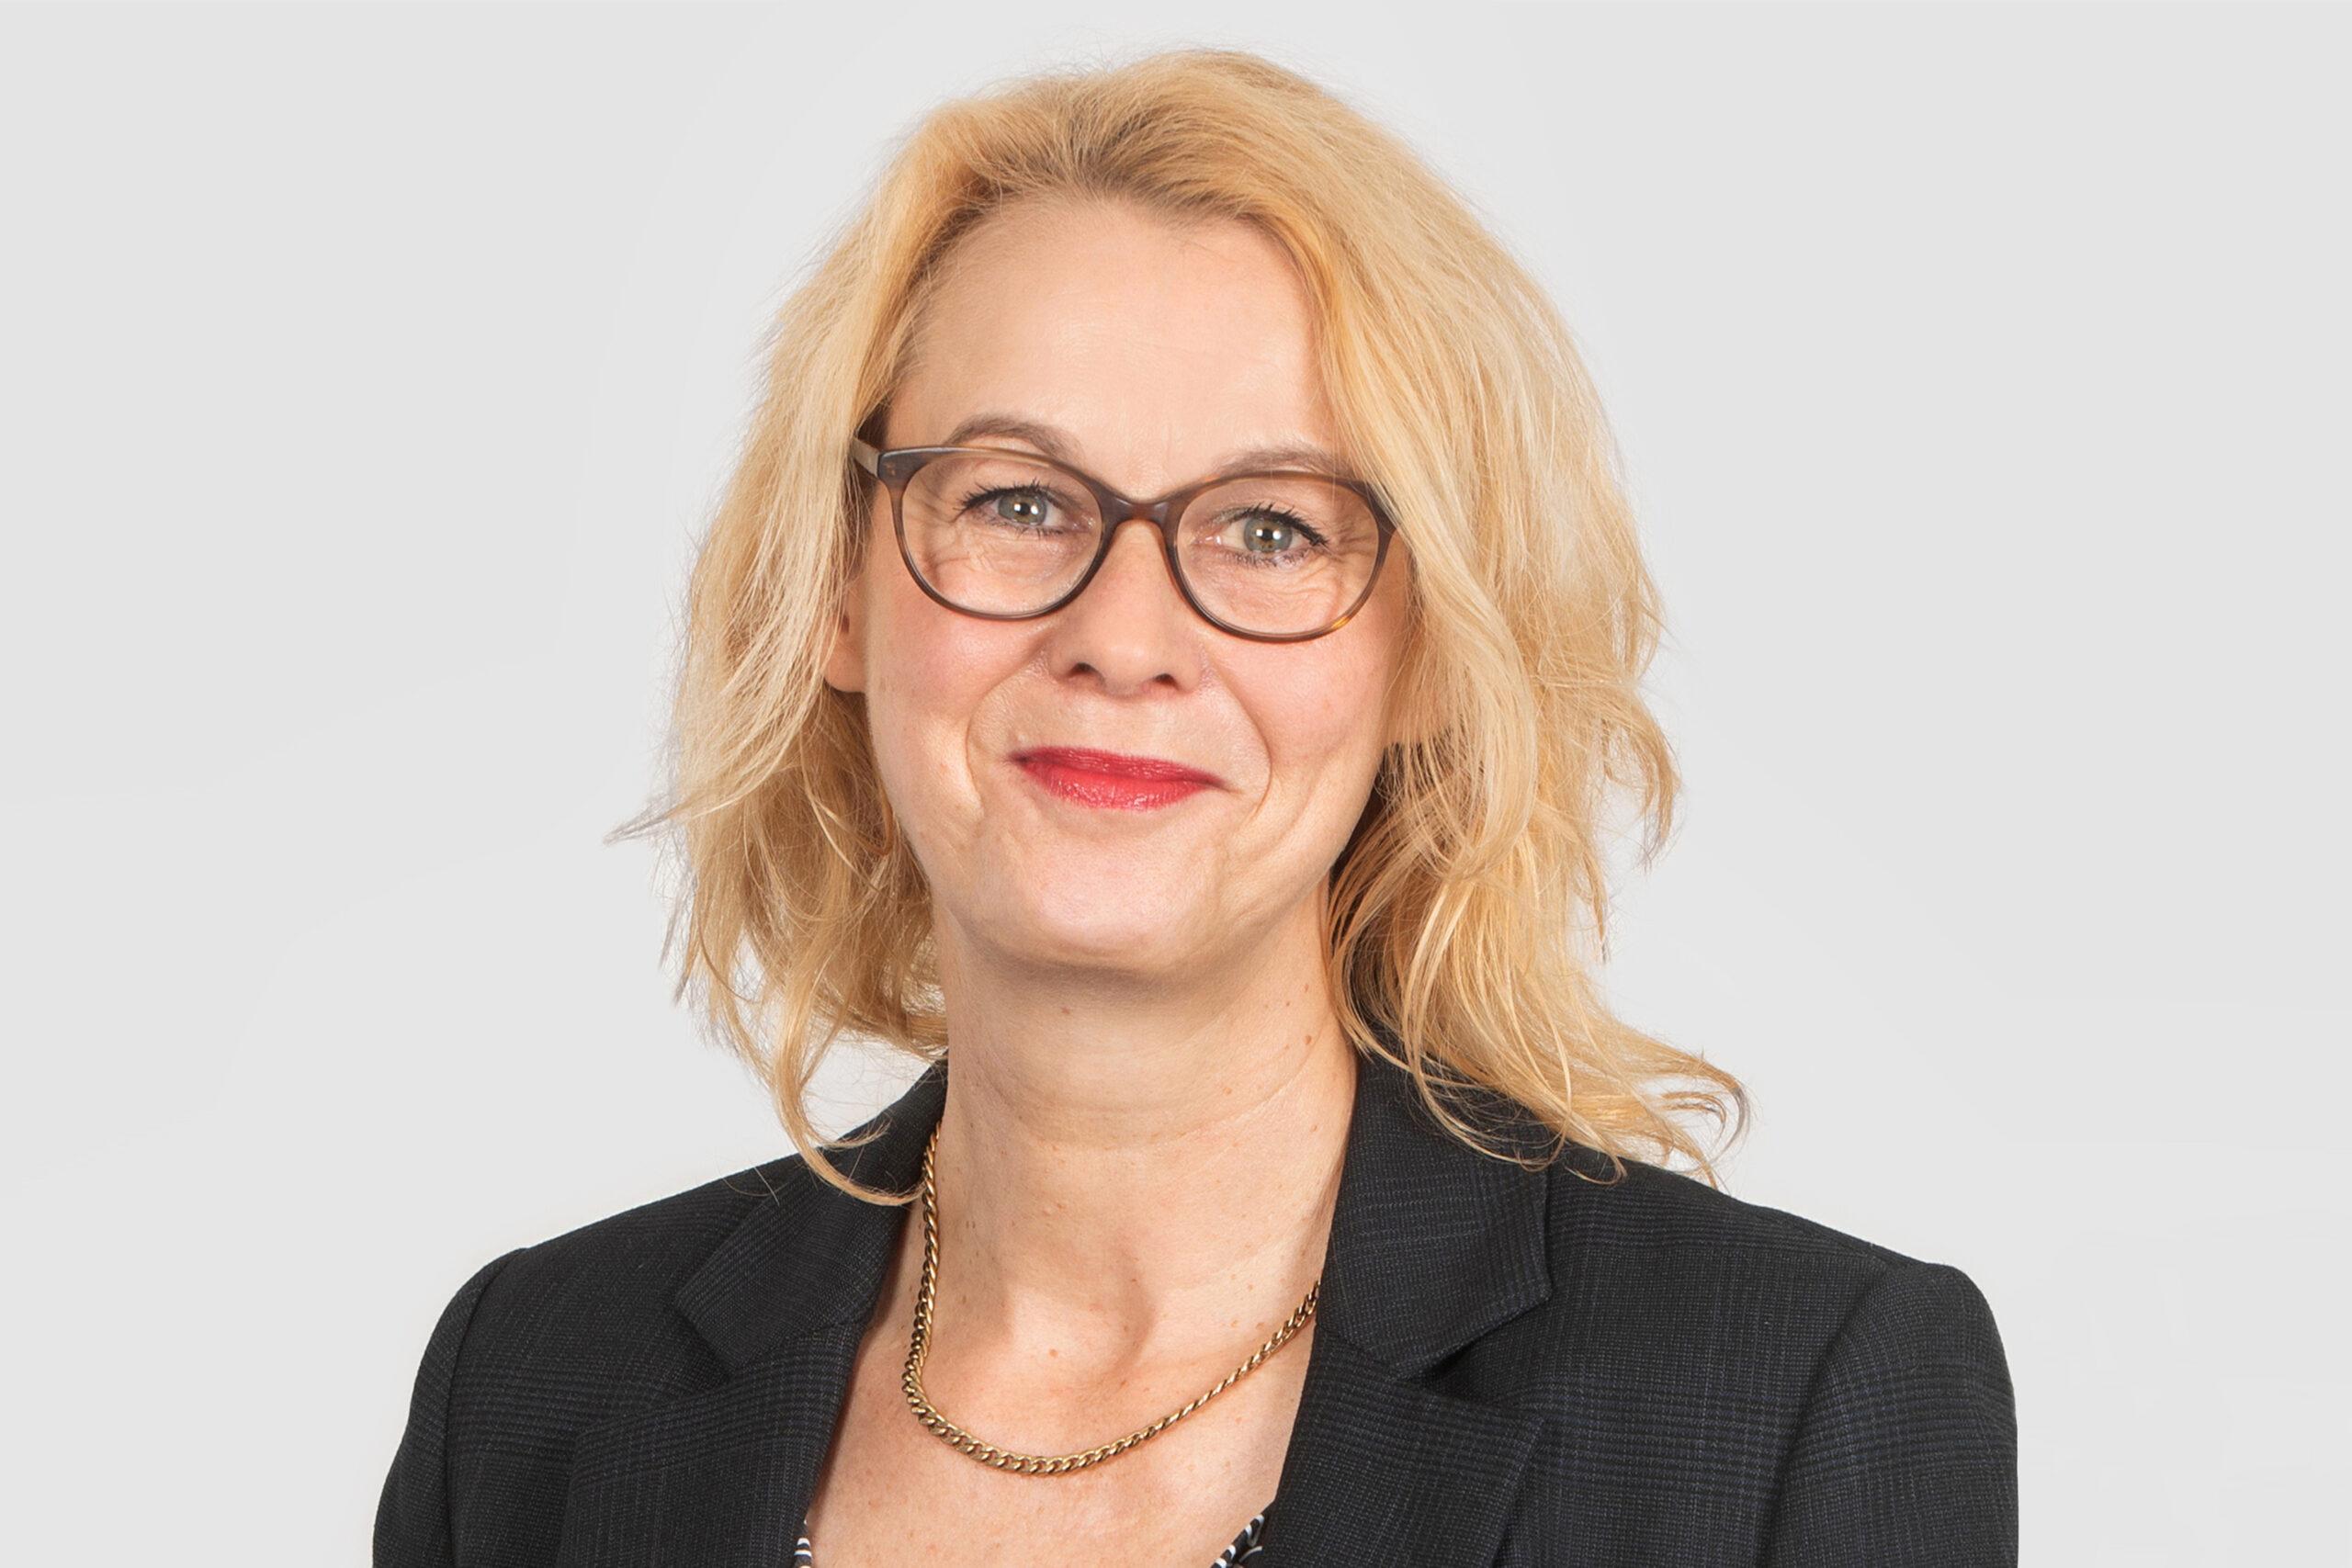 Kerstin Werner